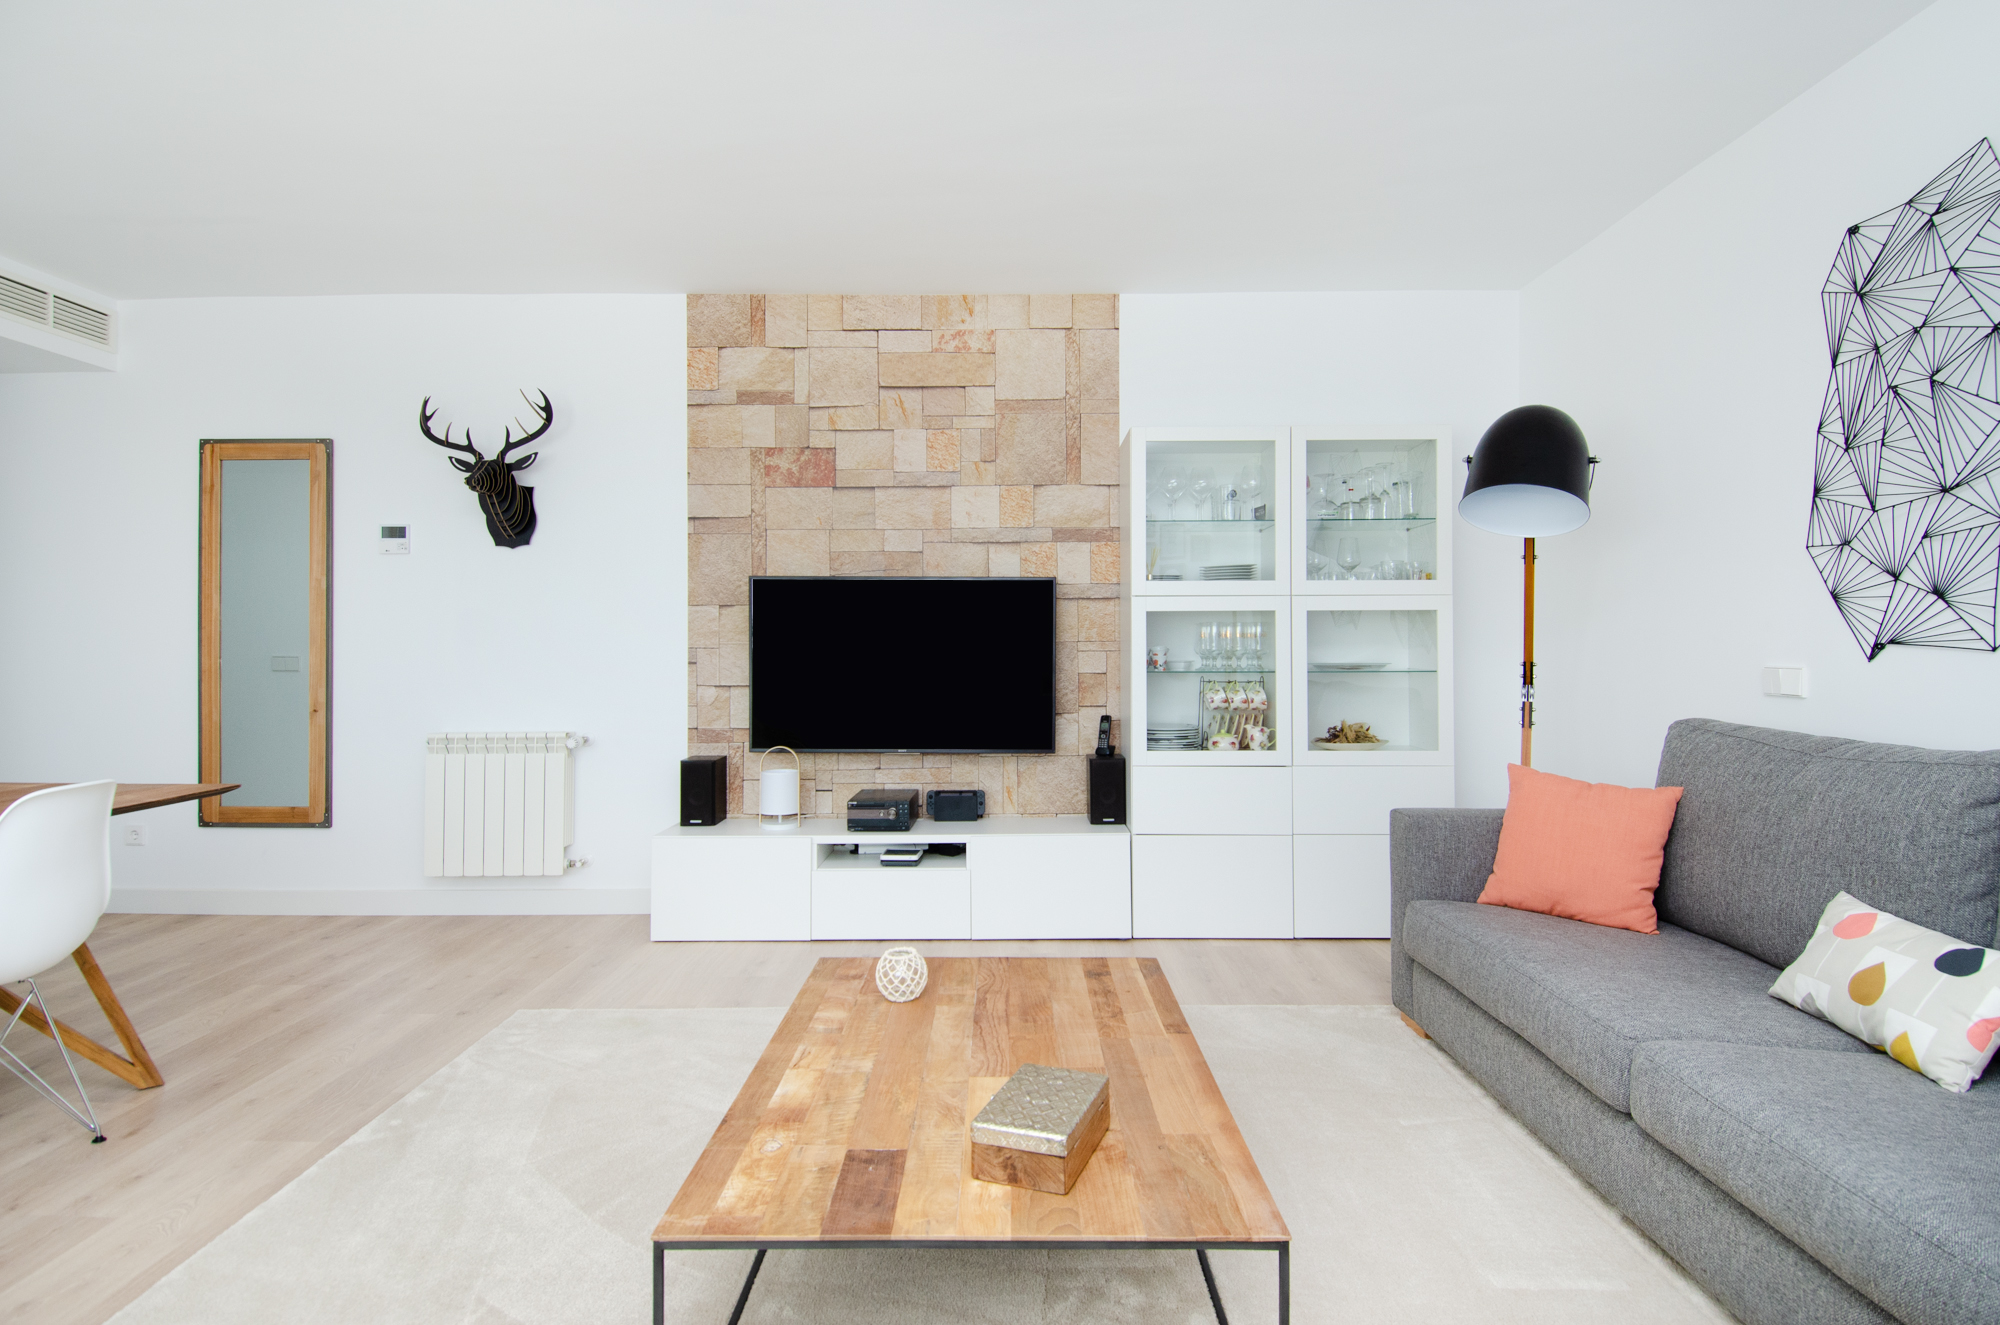 interiorismo-decoracion-ana-de-cabo-reforma-piso-santa-eugenia (9)